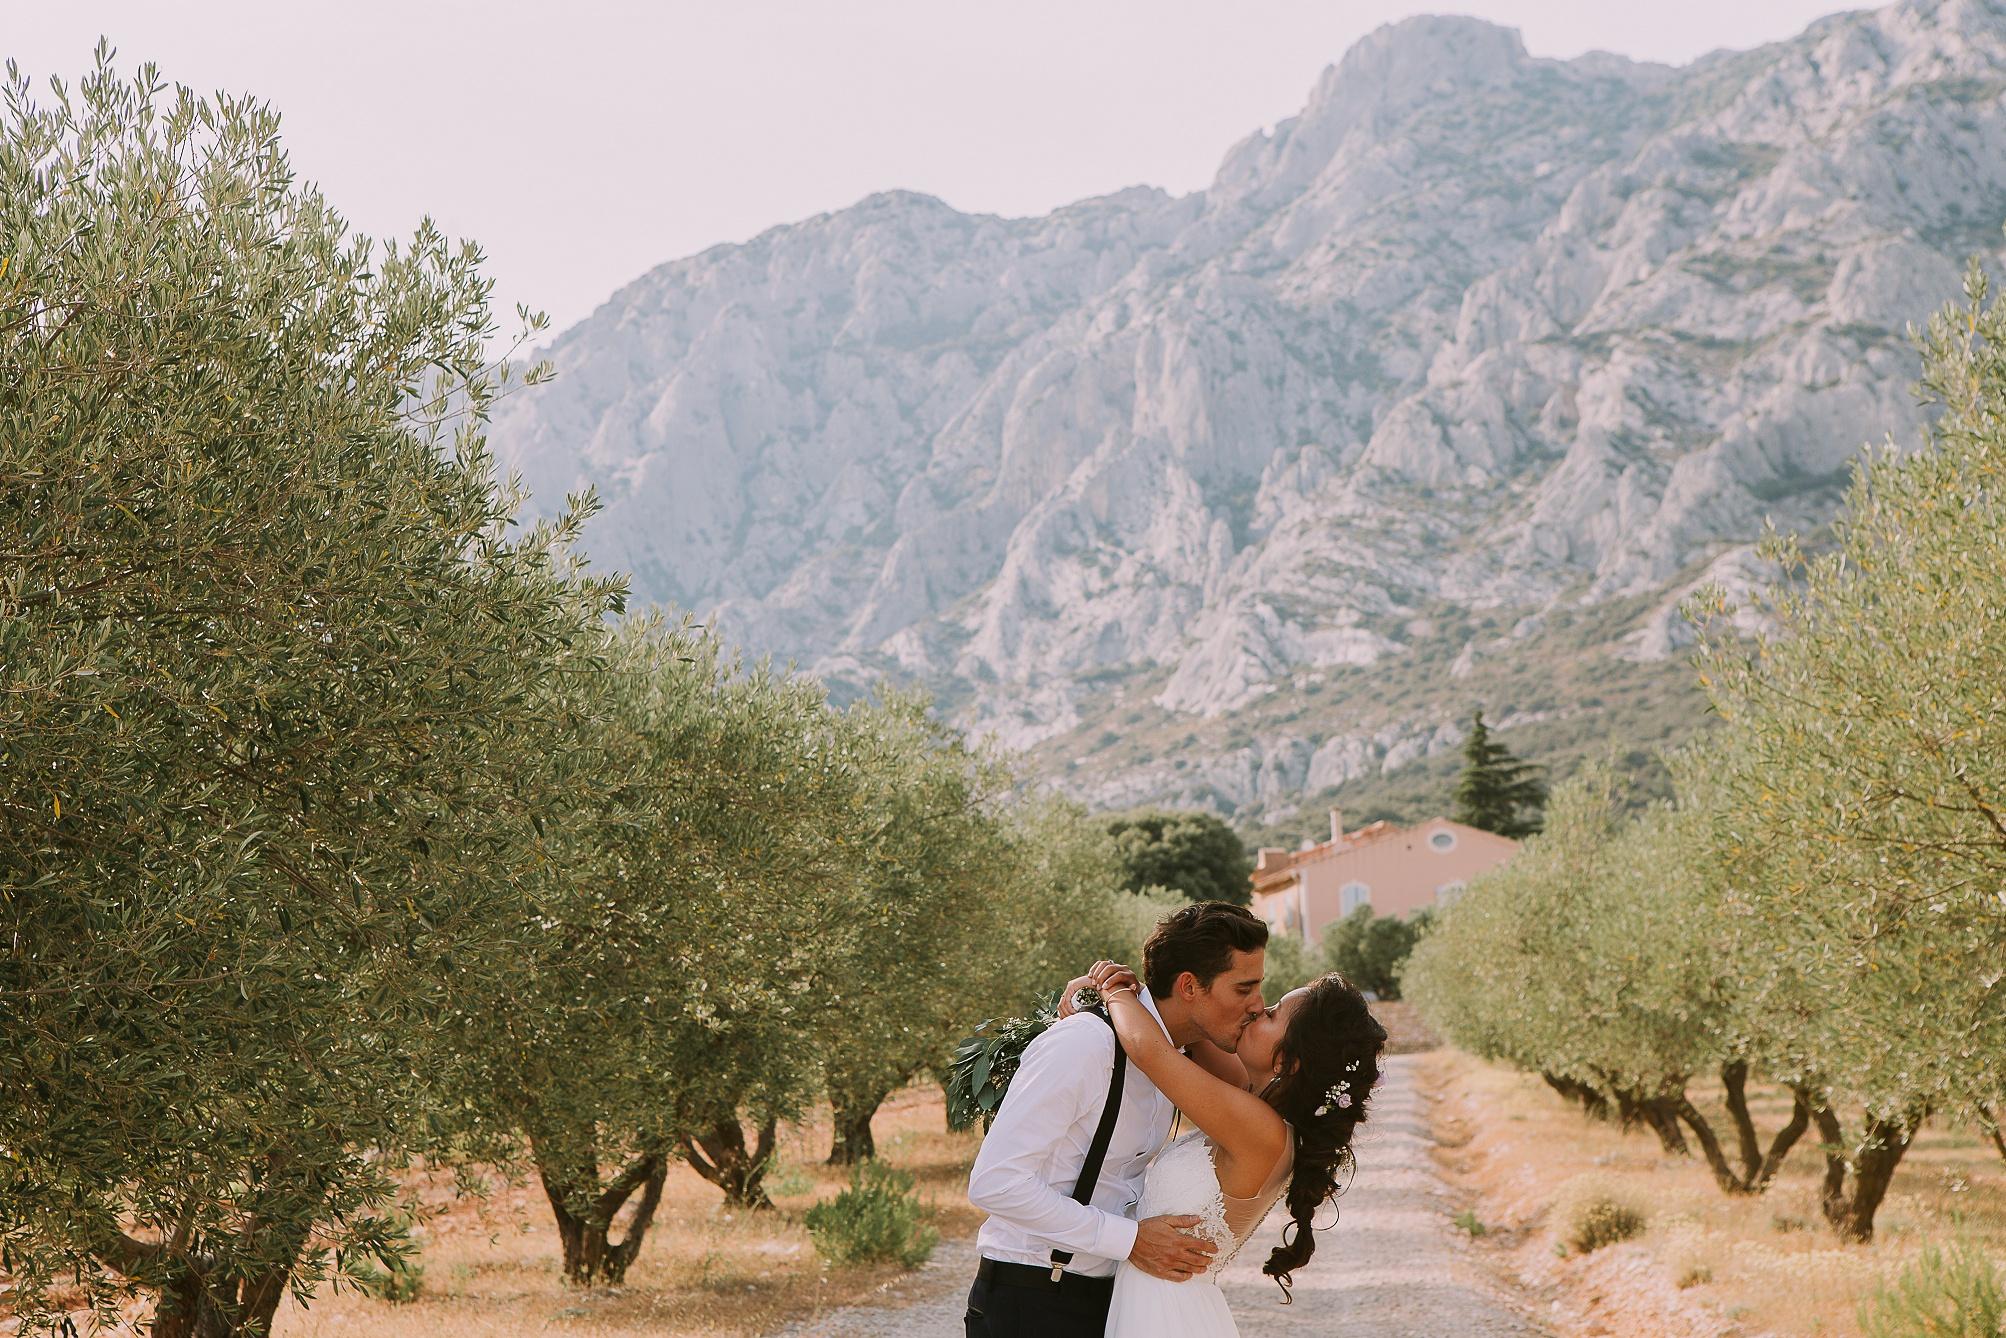 katerynaphotos-mariage-photographe-puyloubier-provence-aix-en-provence-sud-de-la-france_0395.jpg